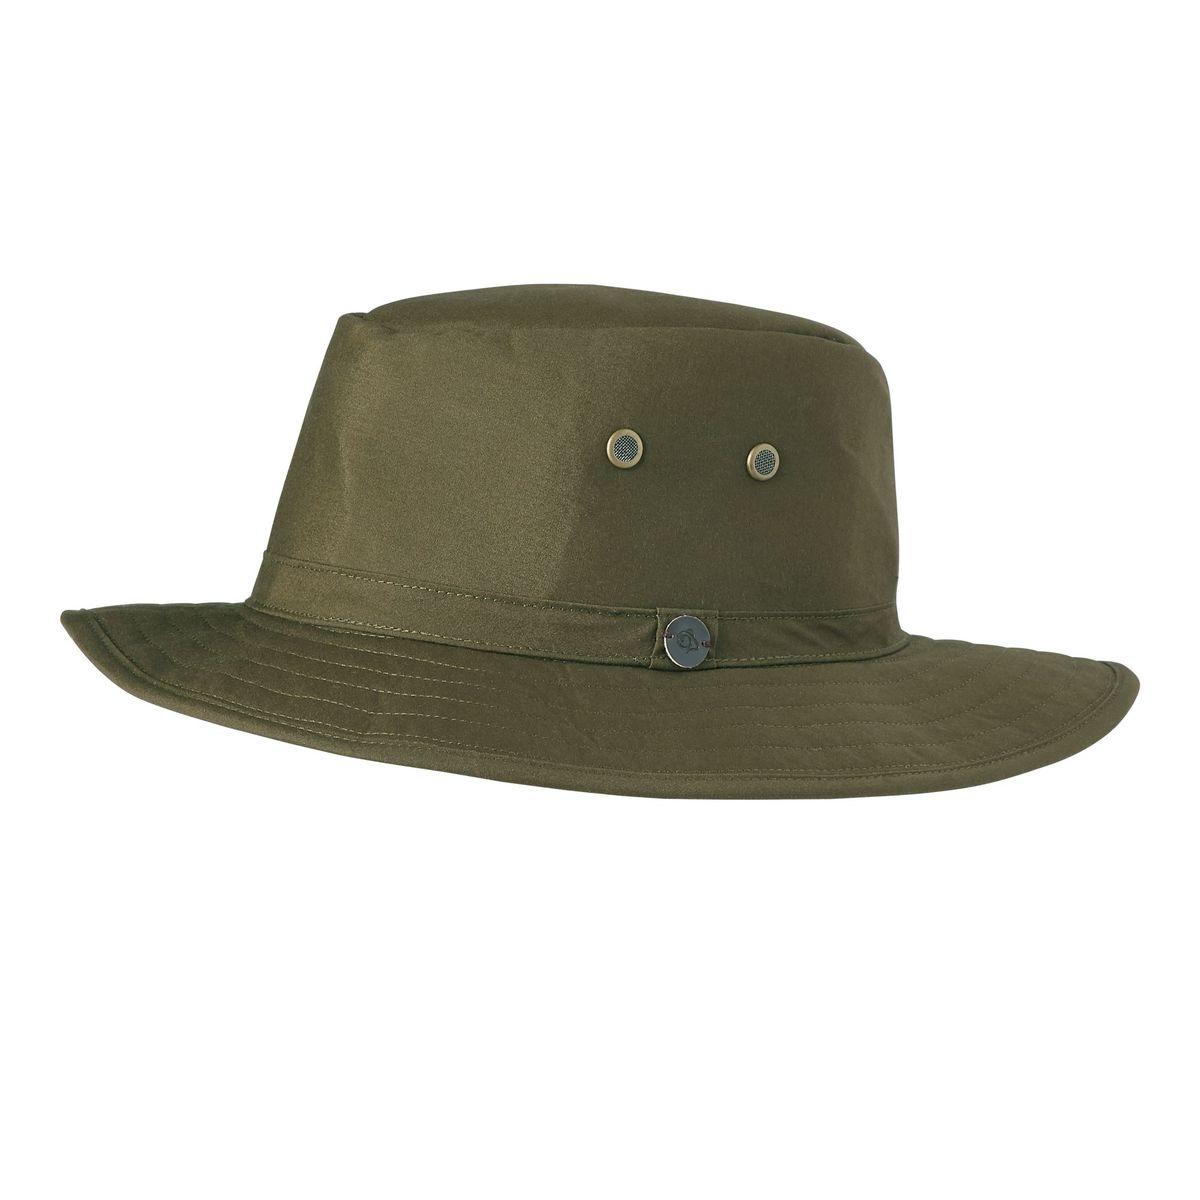 Chapeau de voyage KIWI